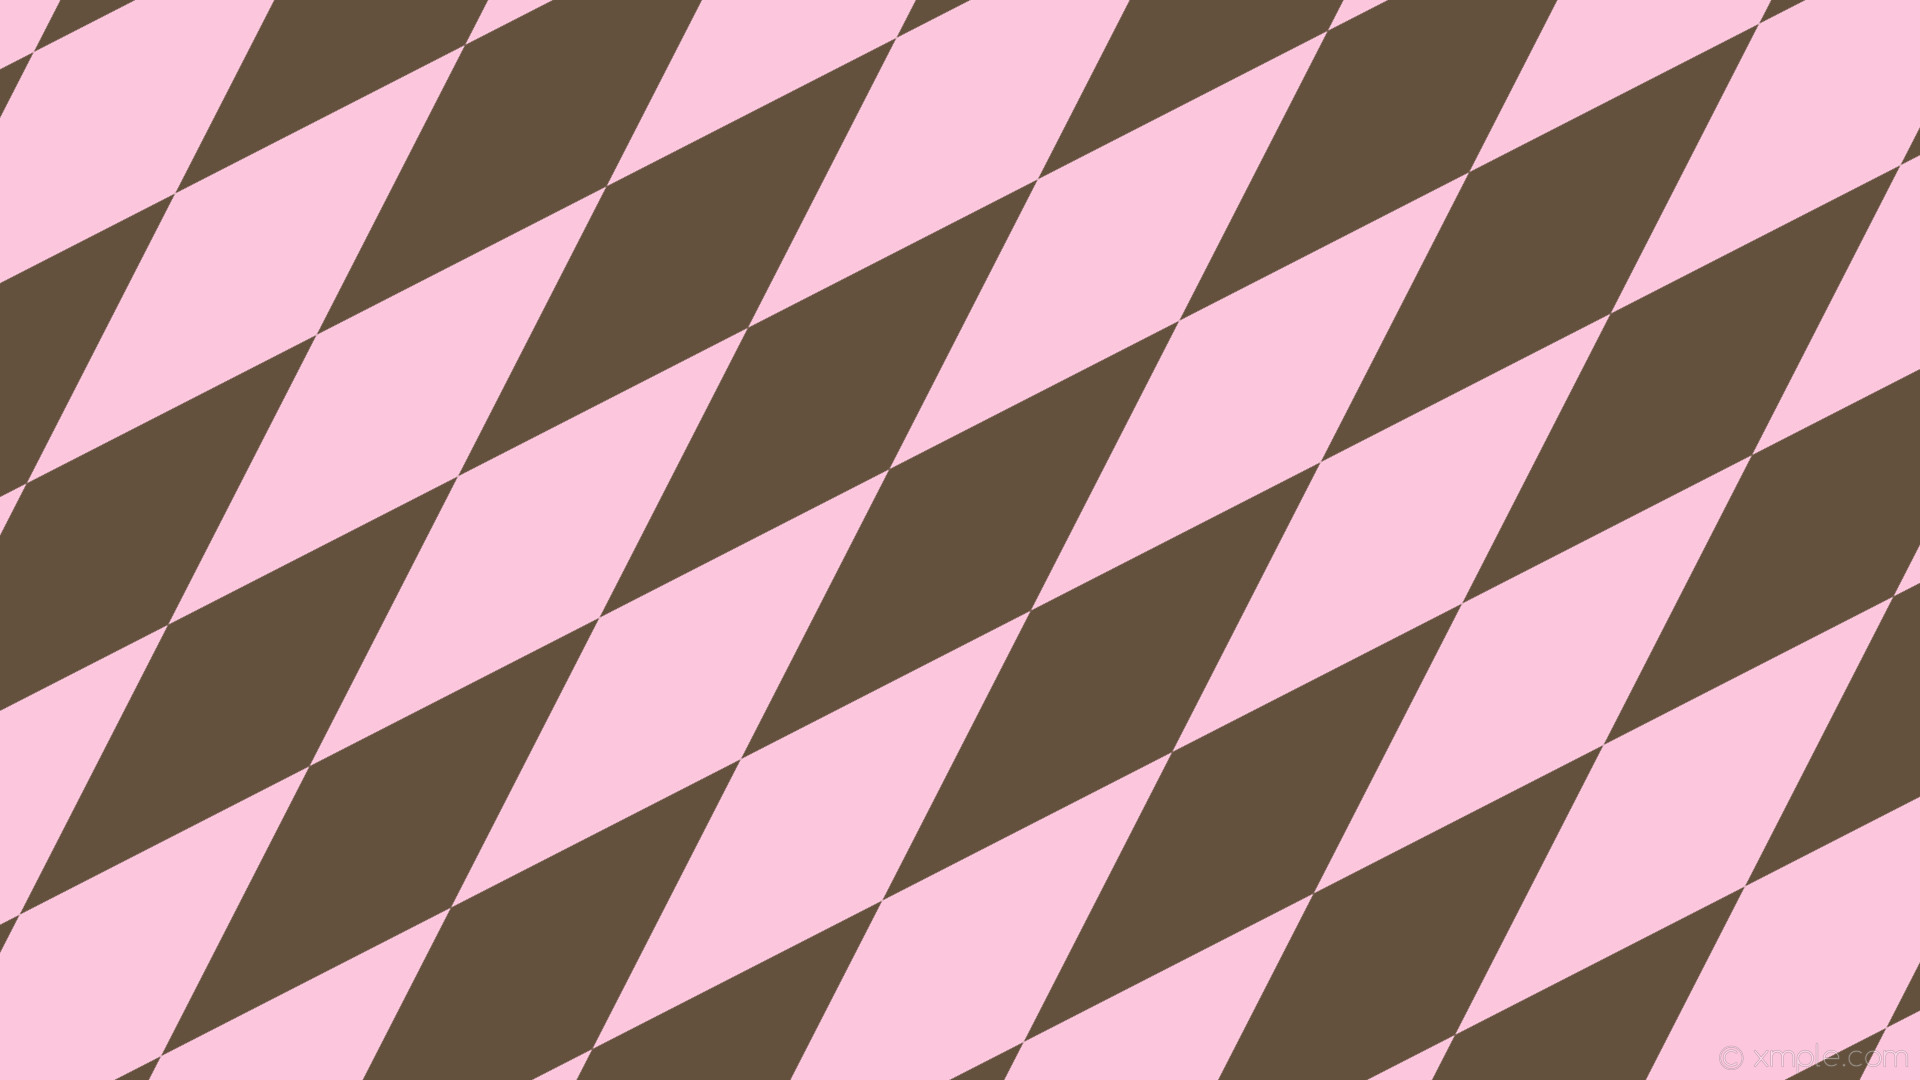 wallpaper orange rhombus lozenge pink diamond light pink #64513d #fcc6dd  45° 620px 200px